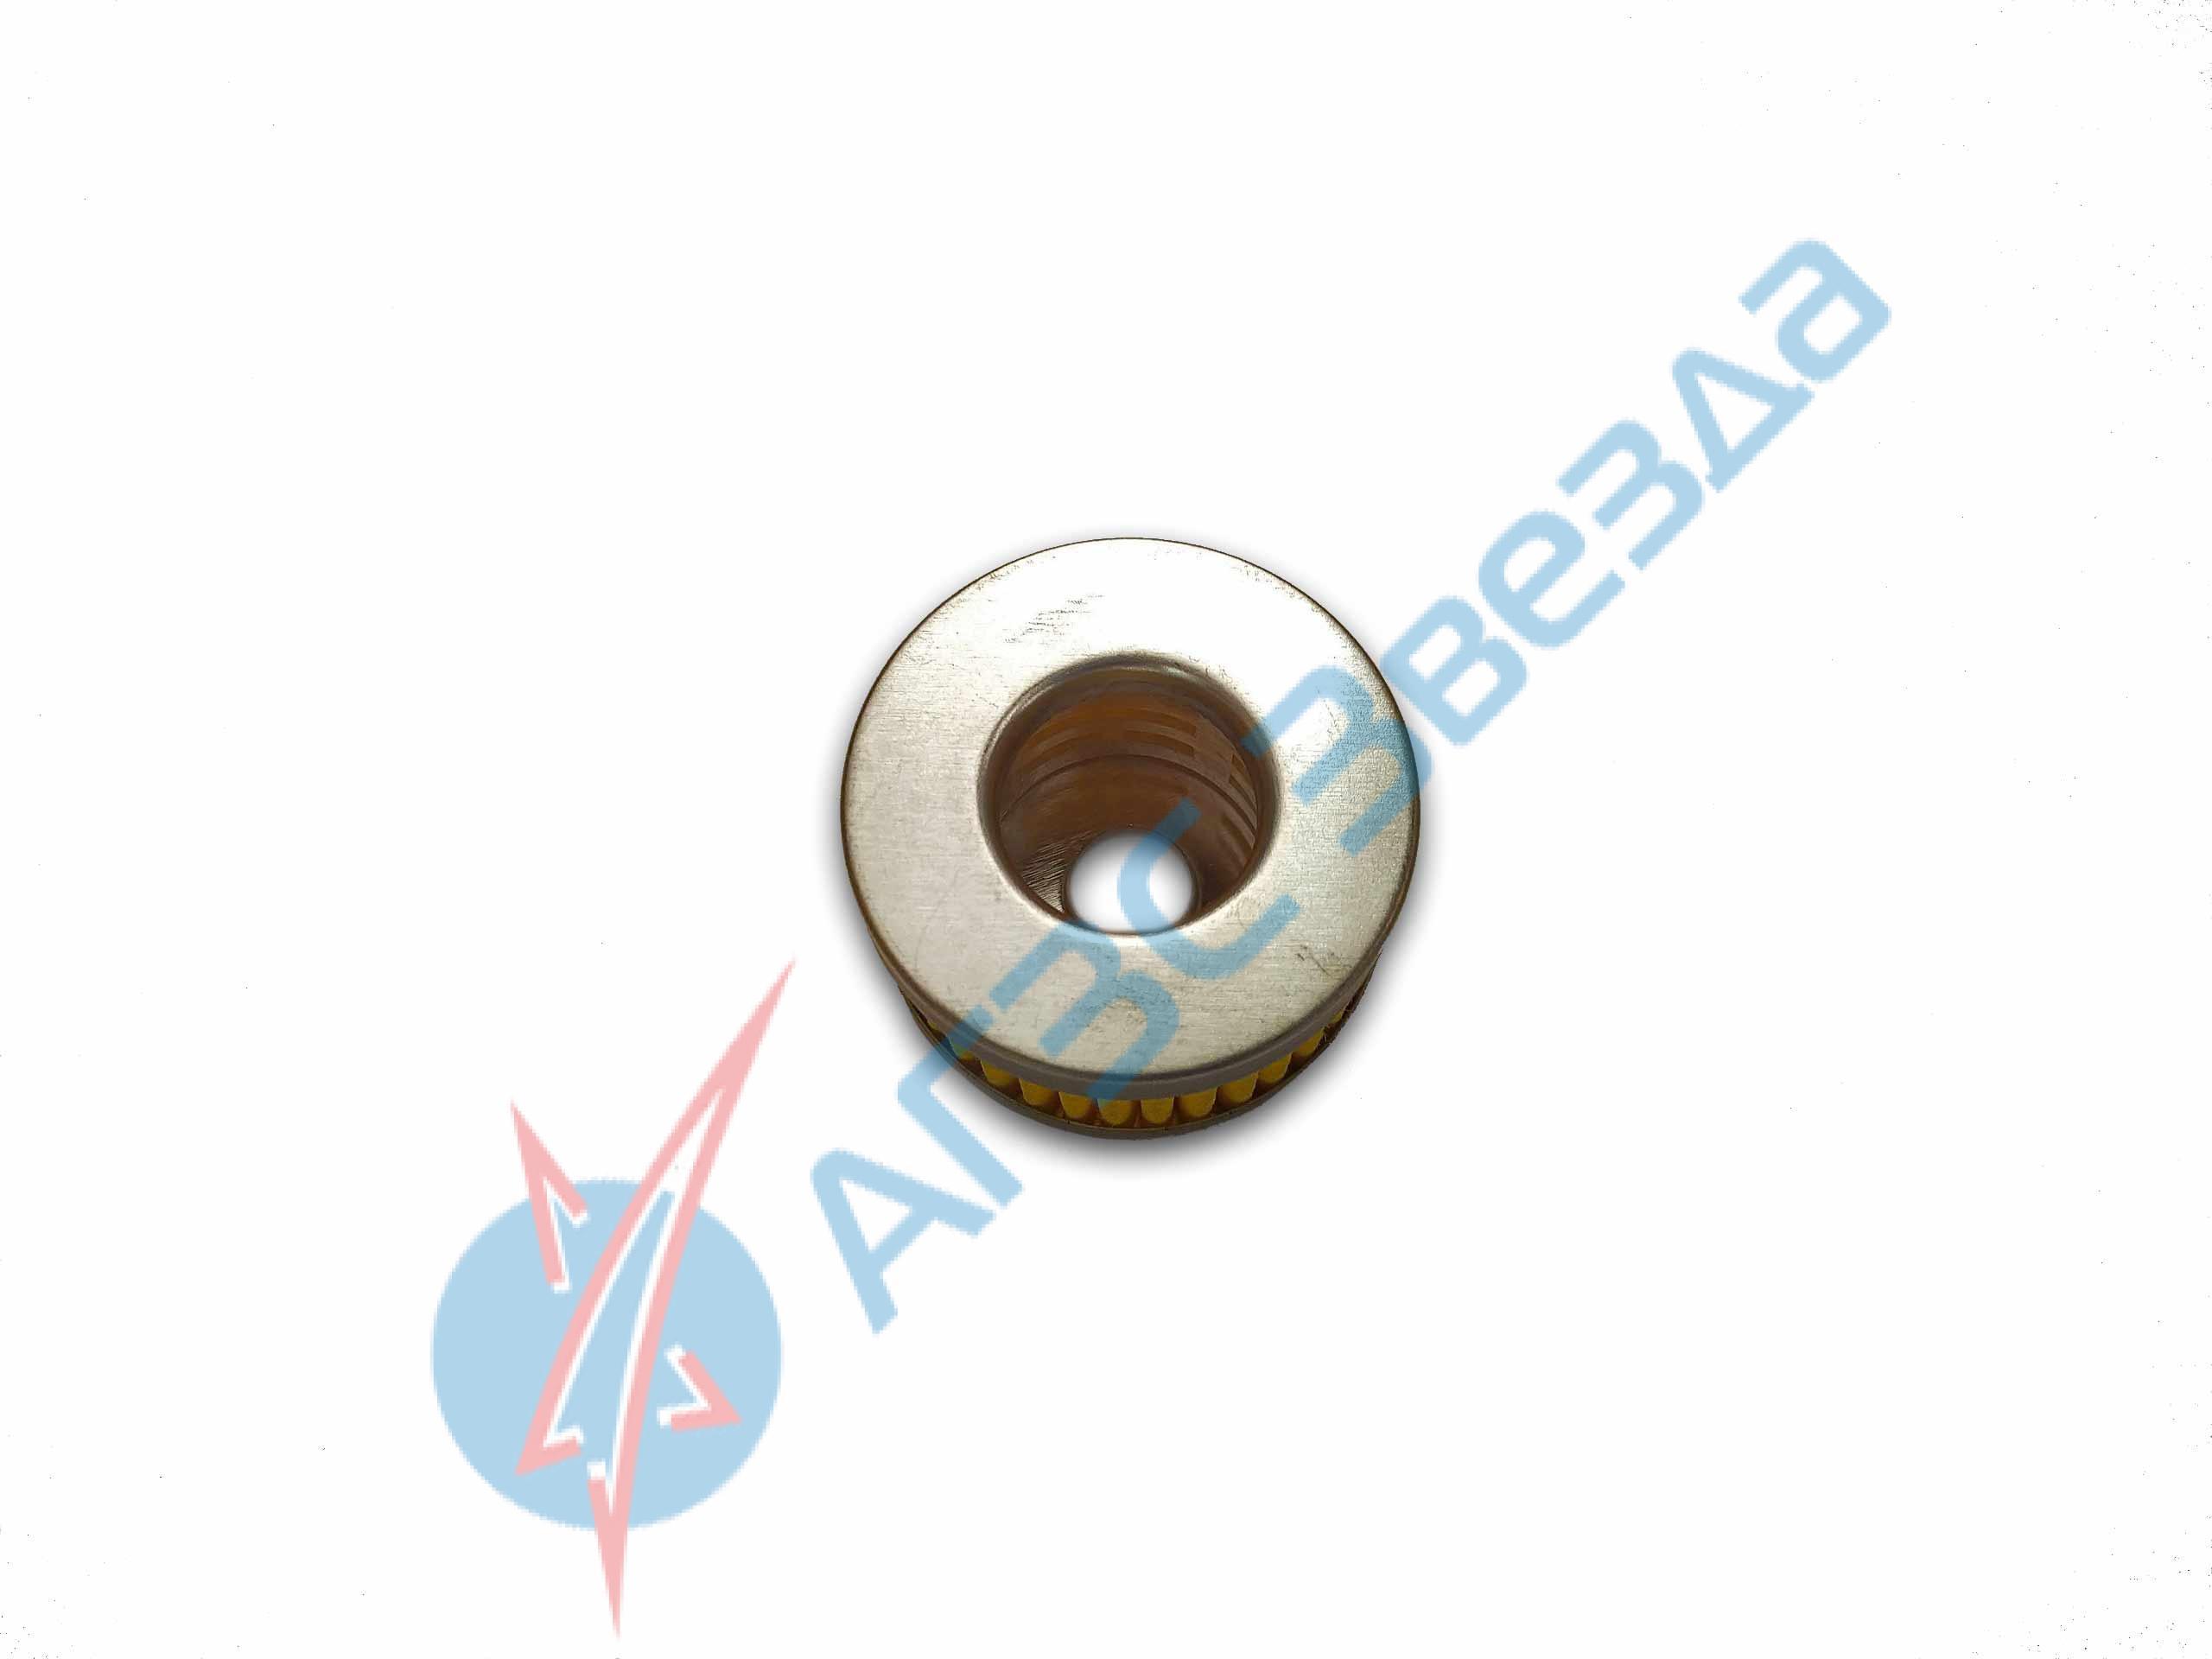 Фильтр клапана газа Tomasetto